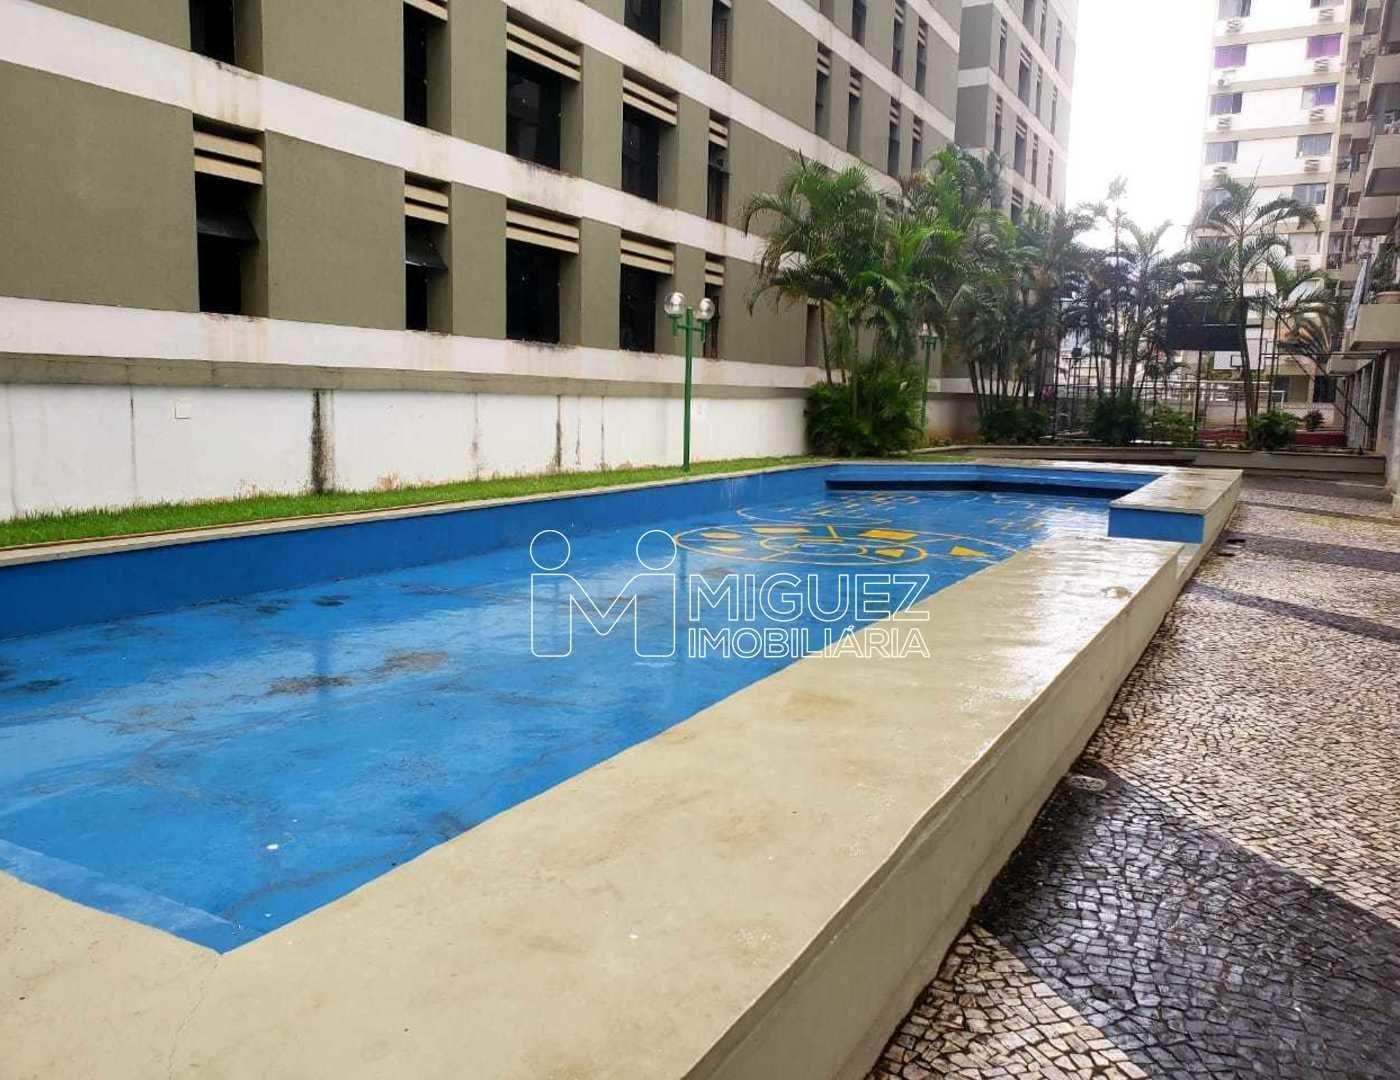 Apartamento, venda, Rua Ibituruna - Maracanã , Rio de janeiro